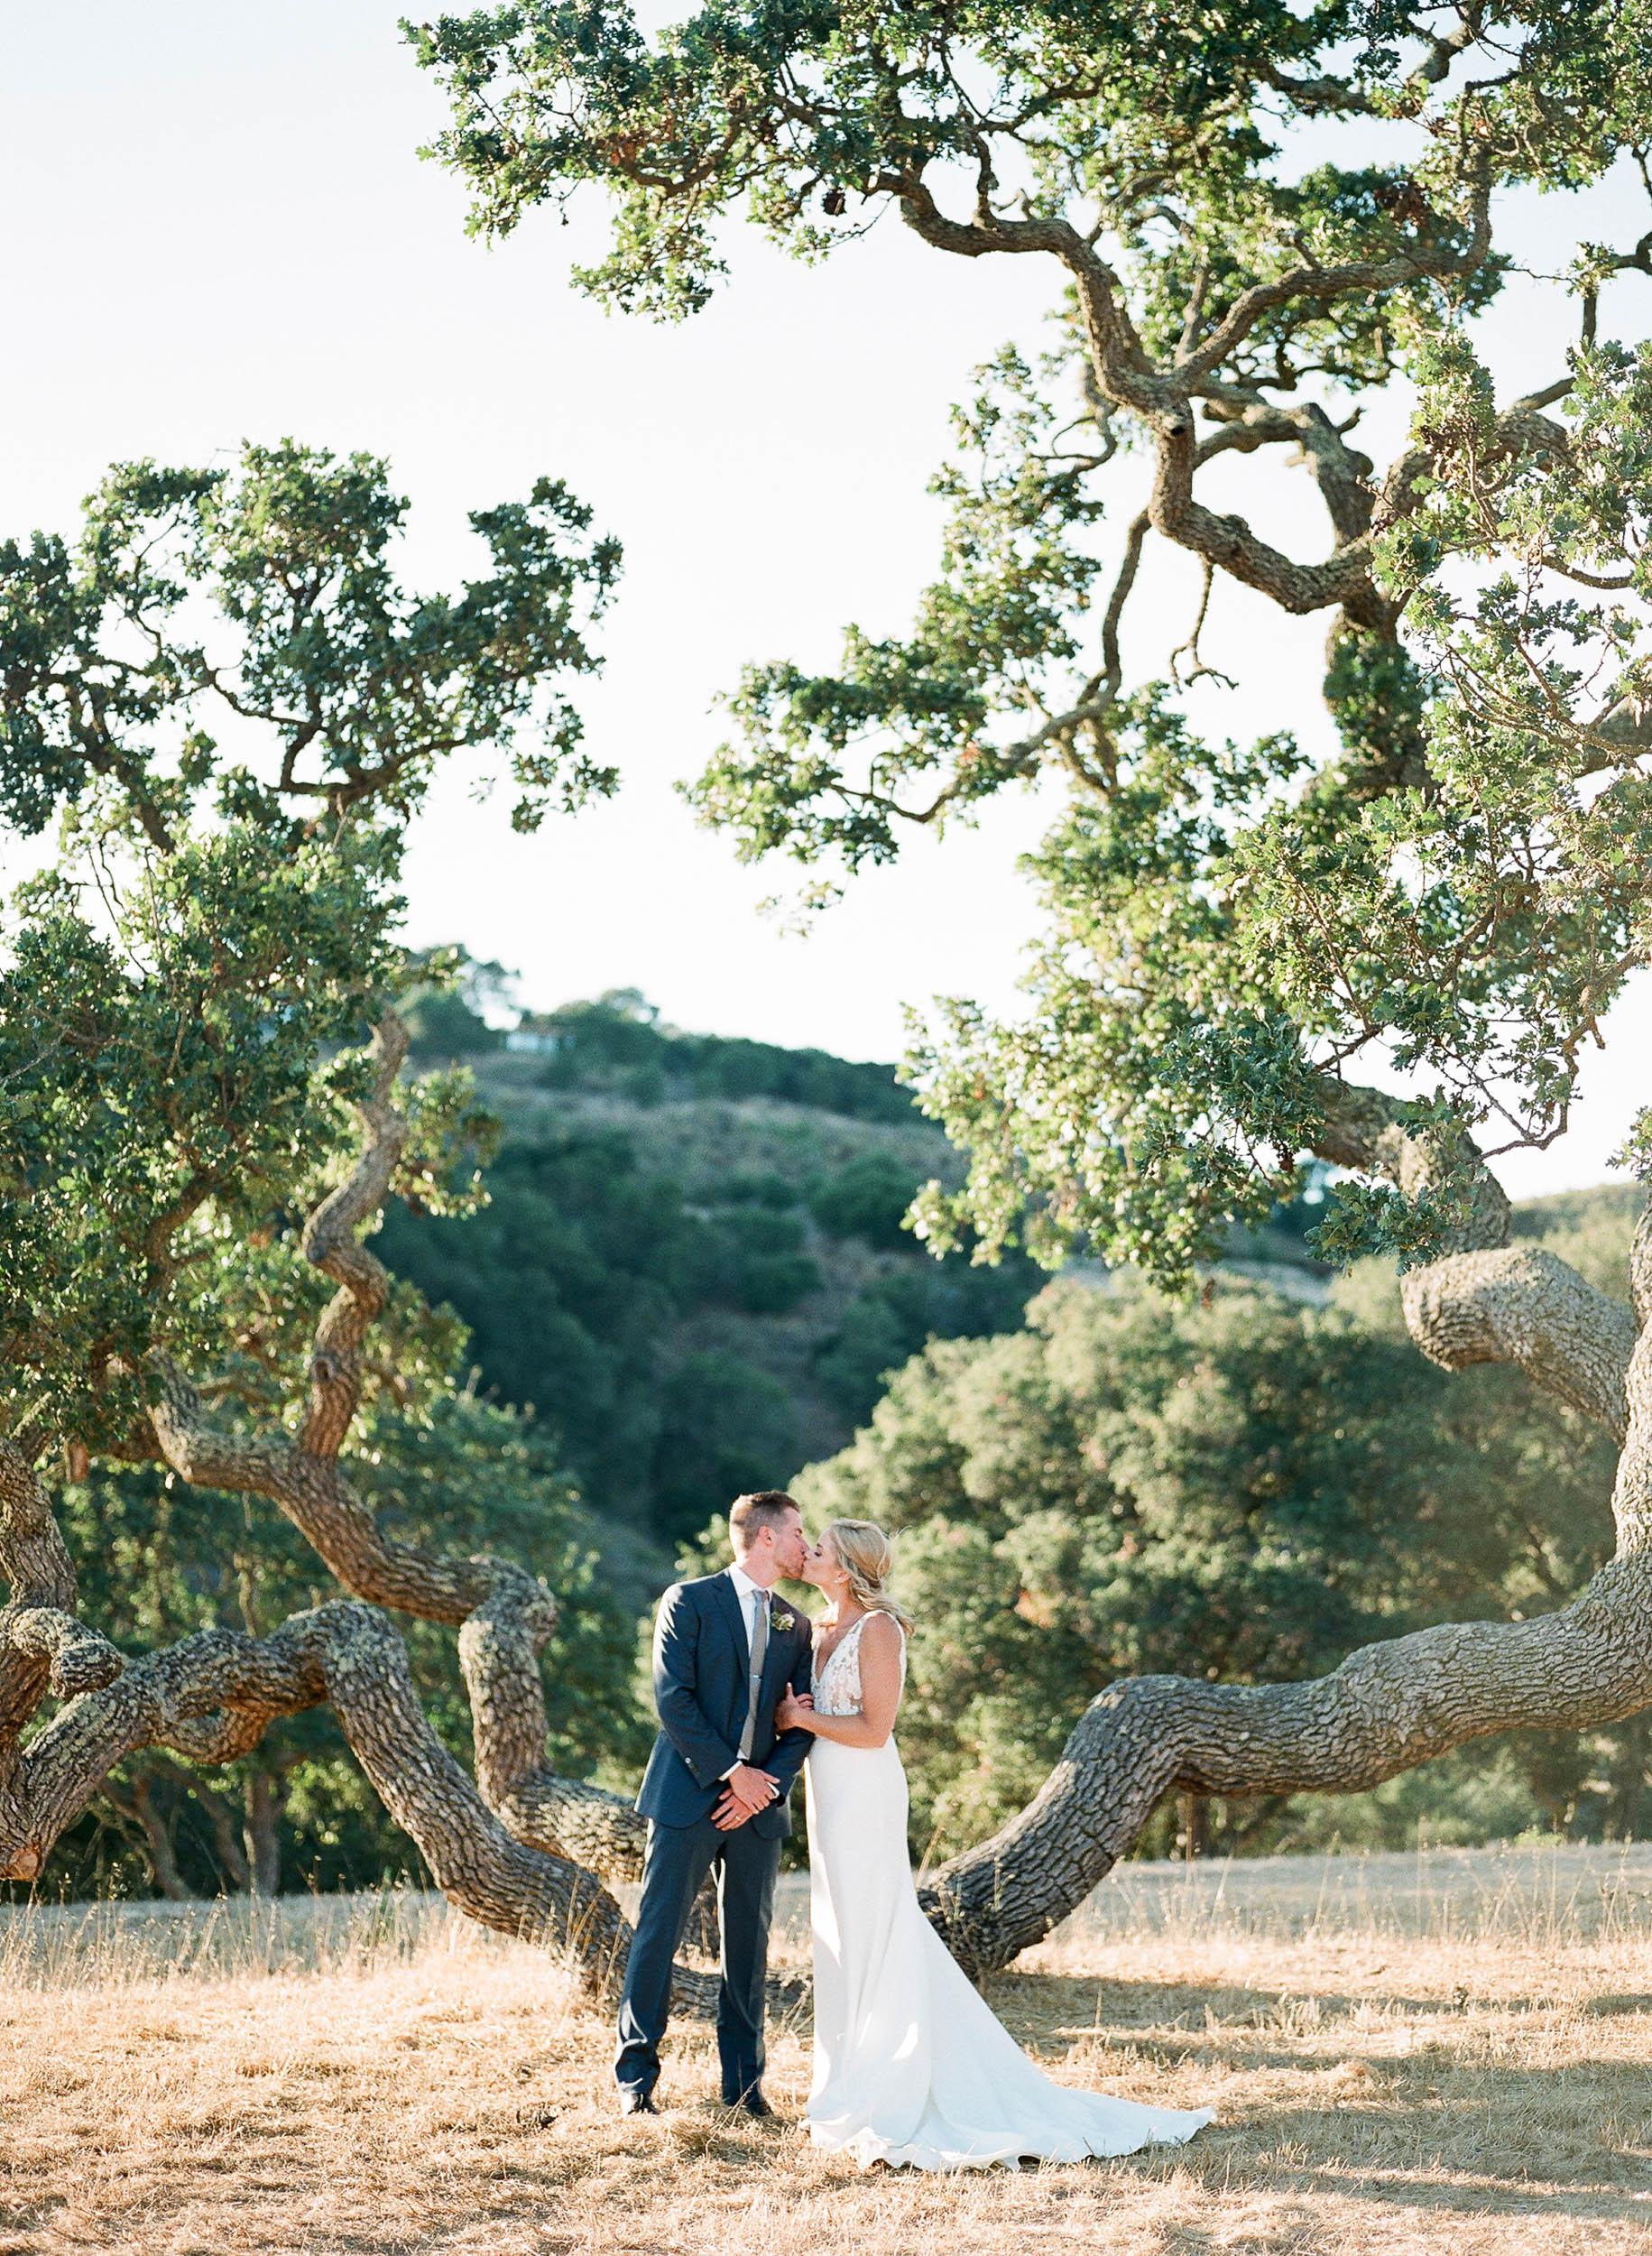 111_072118_D+K_Holman Ranch Wedding_Buena Lane Photography_00005425_41.jpg